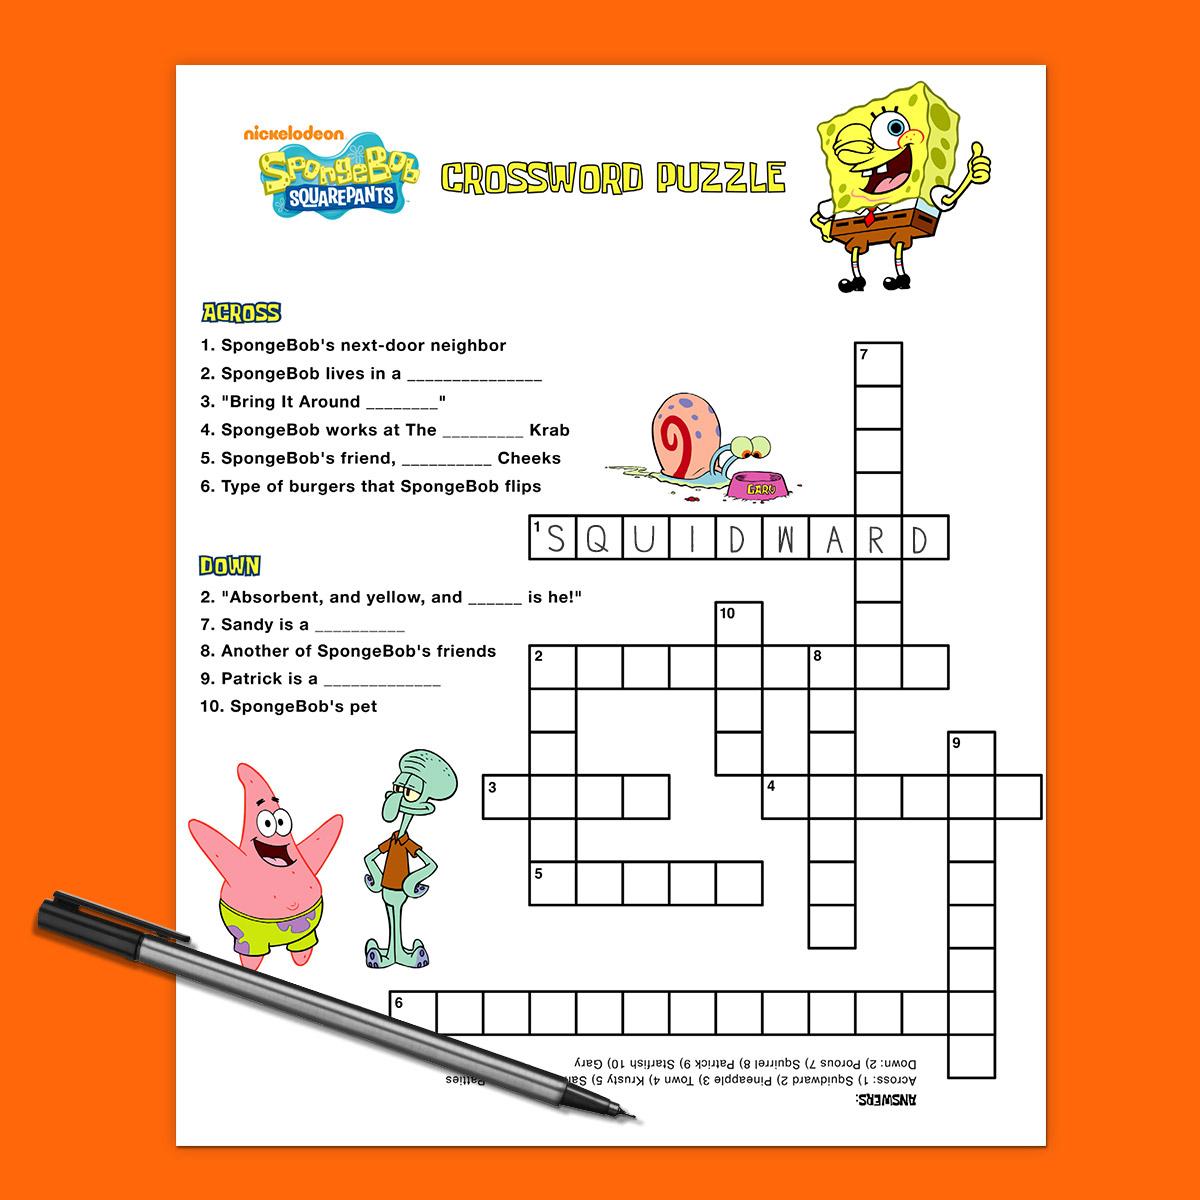 Spongebob Crossword Puzzle   Nickelodeon Parents - Printable Crossword Puzzles Unblocked